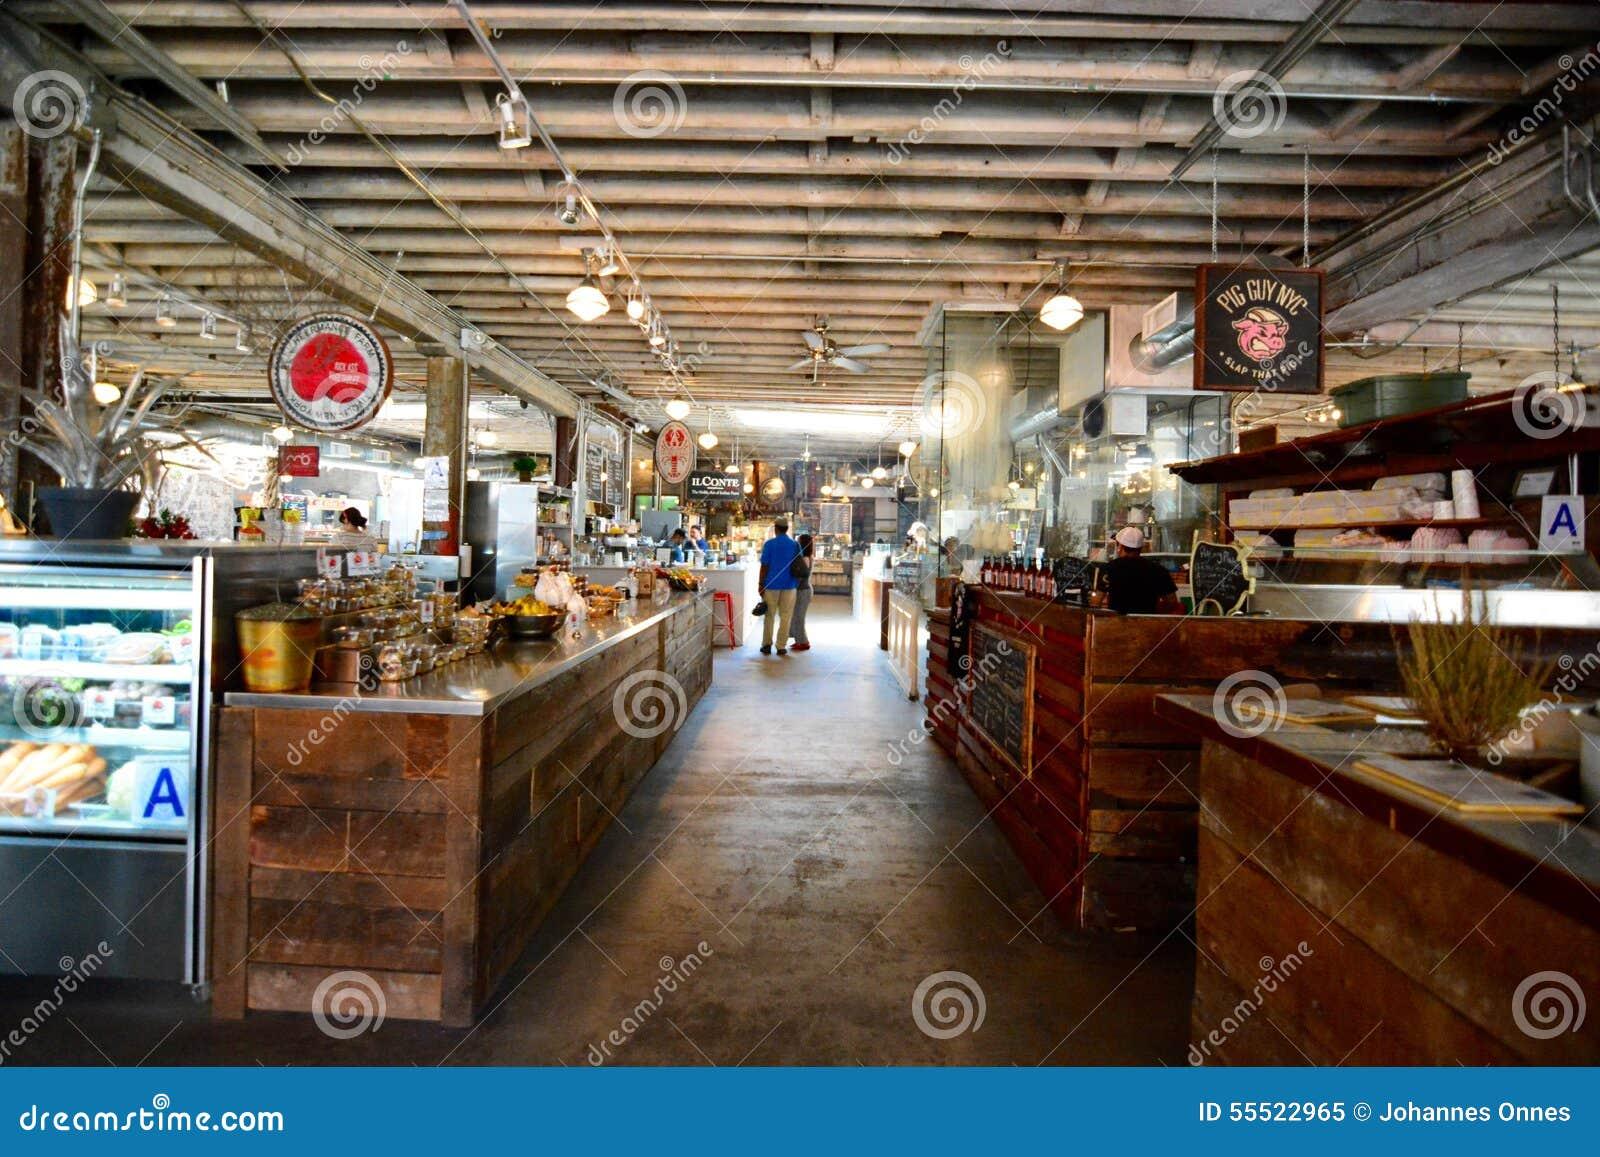 Gansevoort Market gansevoort market editorial image - image: 55522965